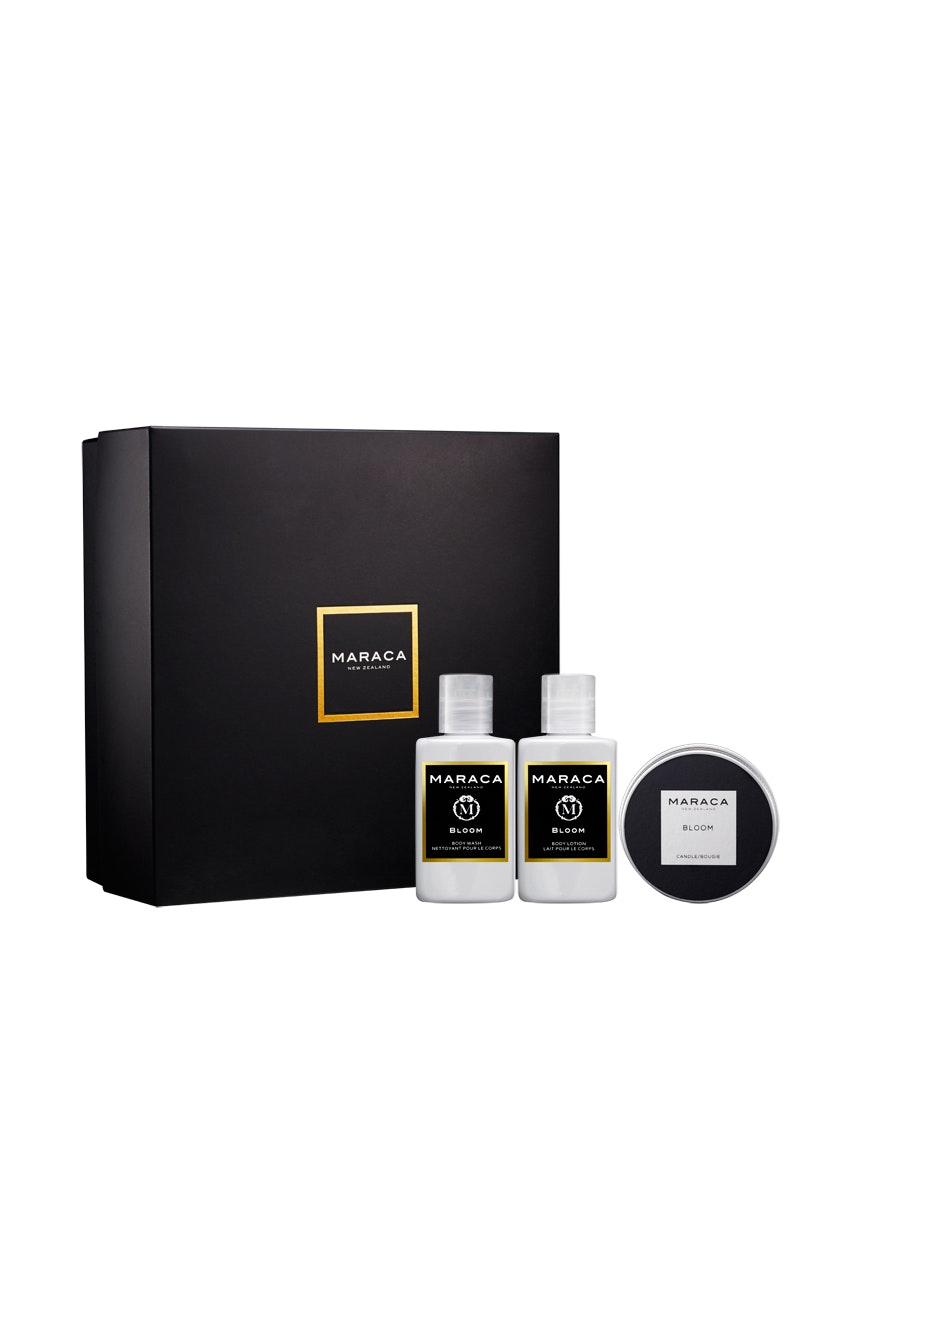 Maraca - Bloom Travel Pack (Body Wash 100ml + Body Lotion 100ml + Travel Candle 80g)